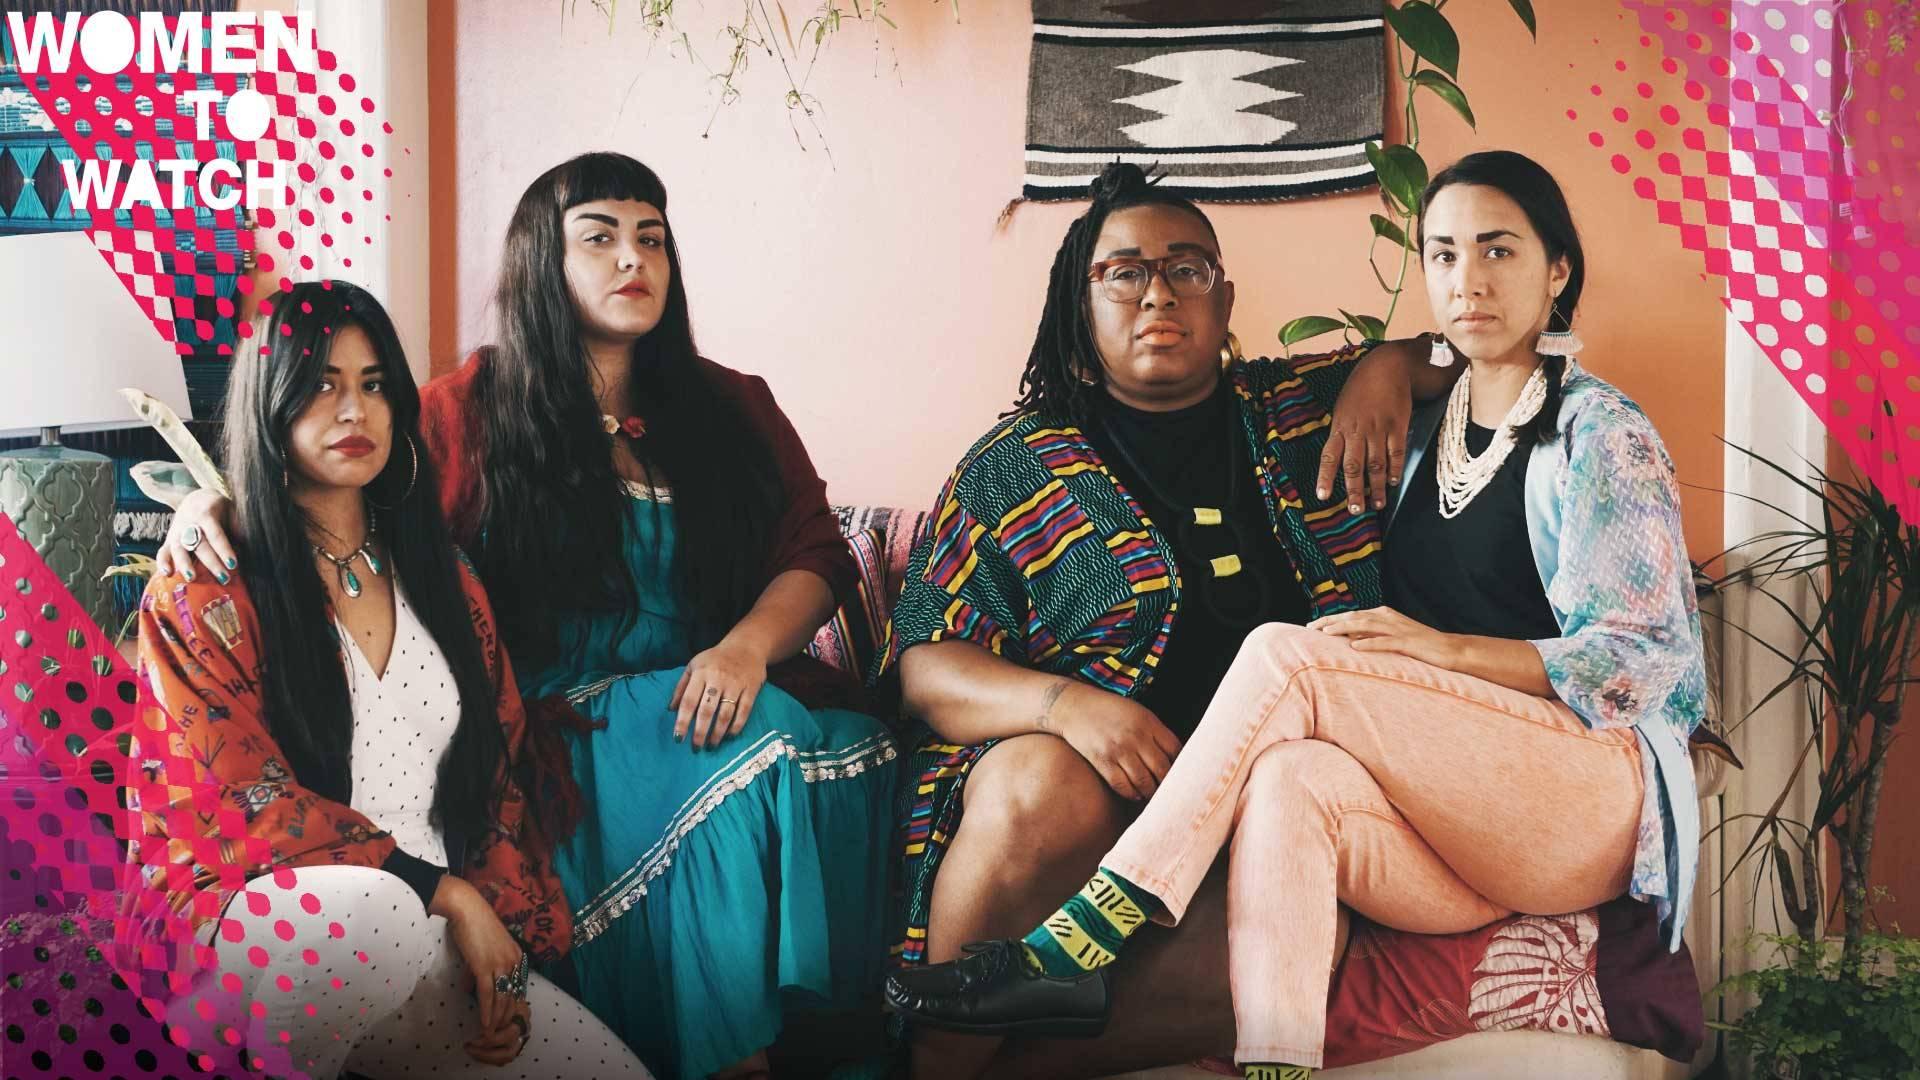 Black Salt Collective (L-R): Grace Rosario Perkins, Sarah Biscarra-Dilley, Adee Roberson, Anna Luisa Petrisko Photo by Texas Isaiah